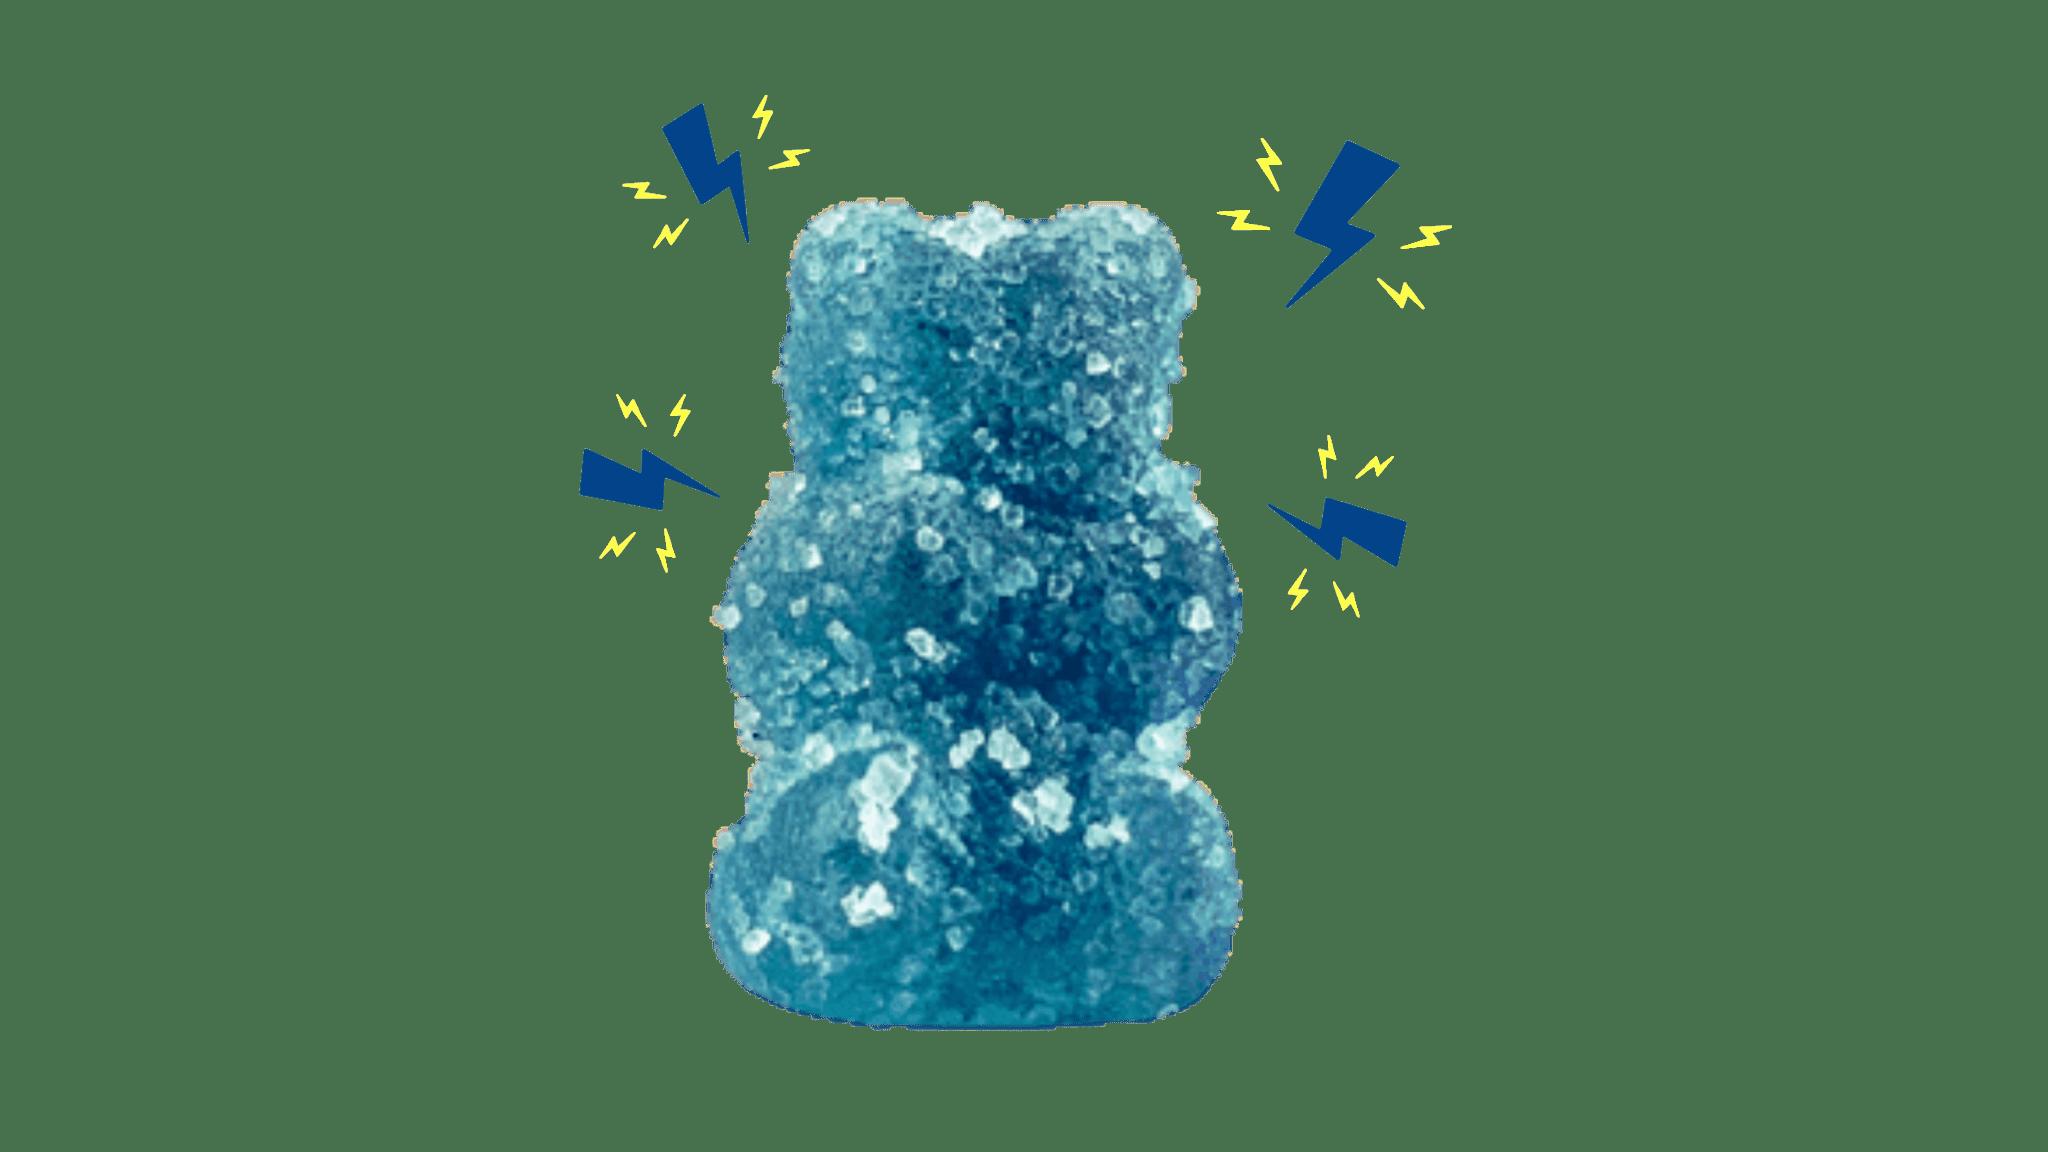 stressed-blue-gummy